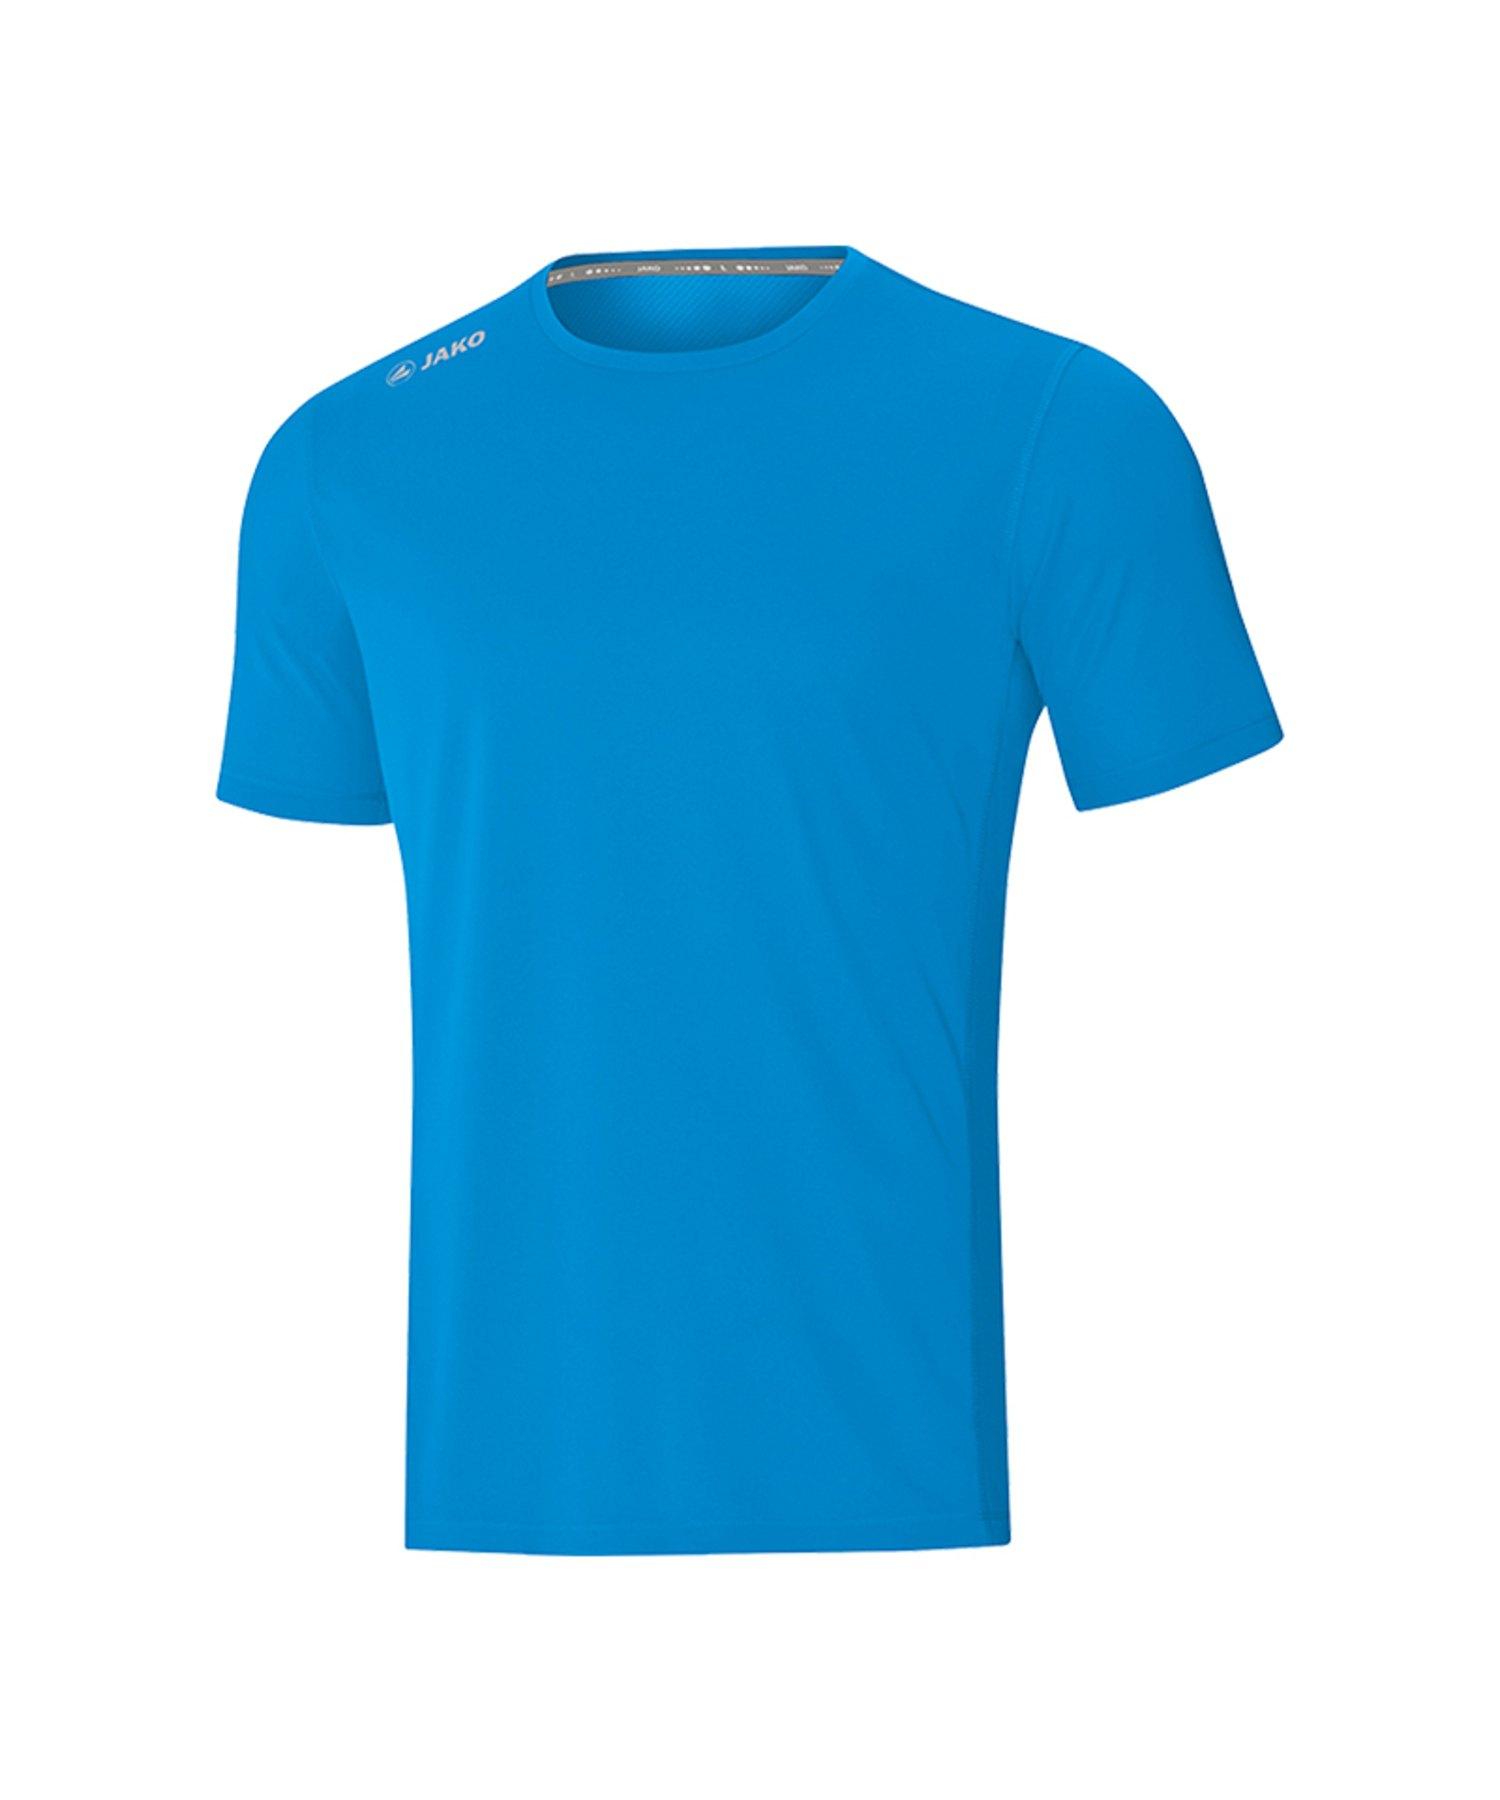 Jako Run 2.0 T-Shirt Running Blau F89 - Blau